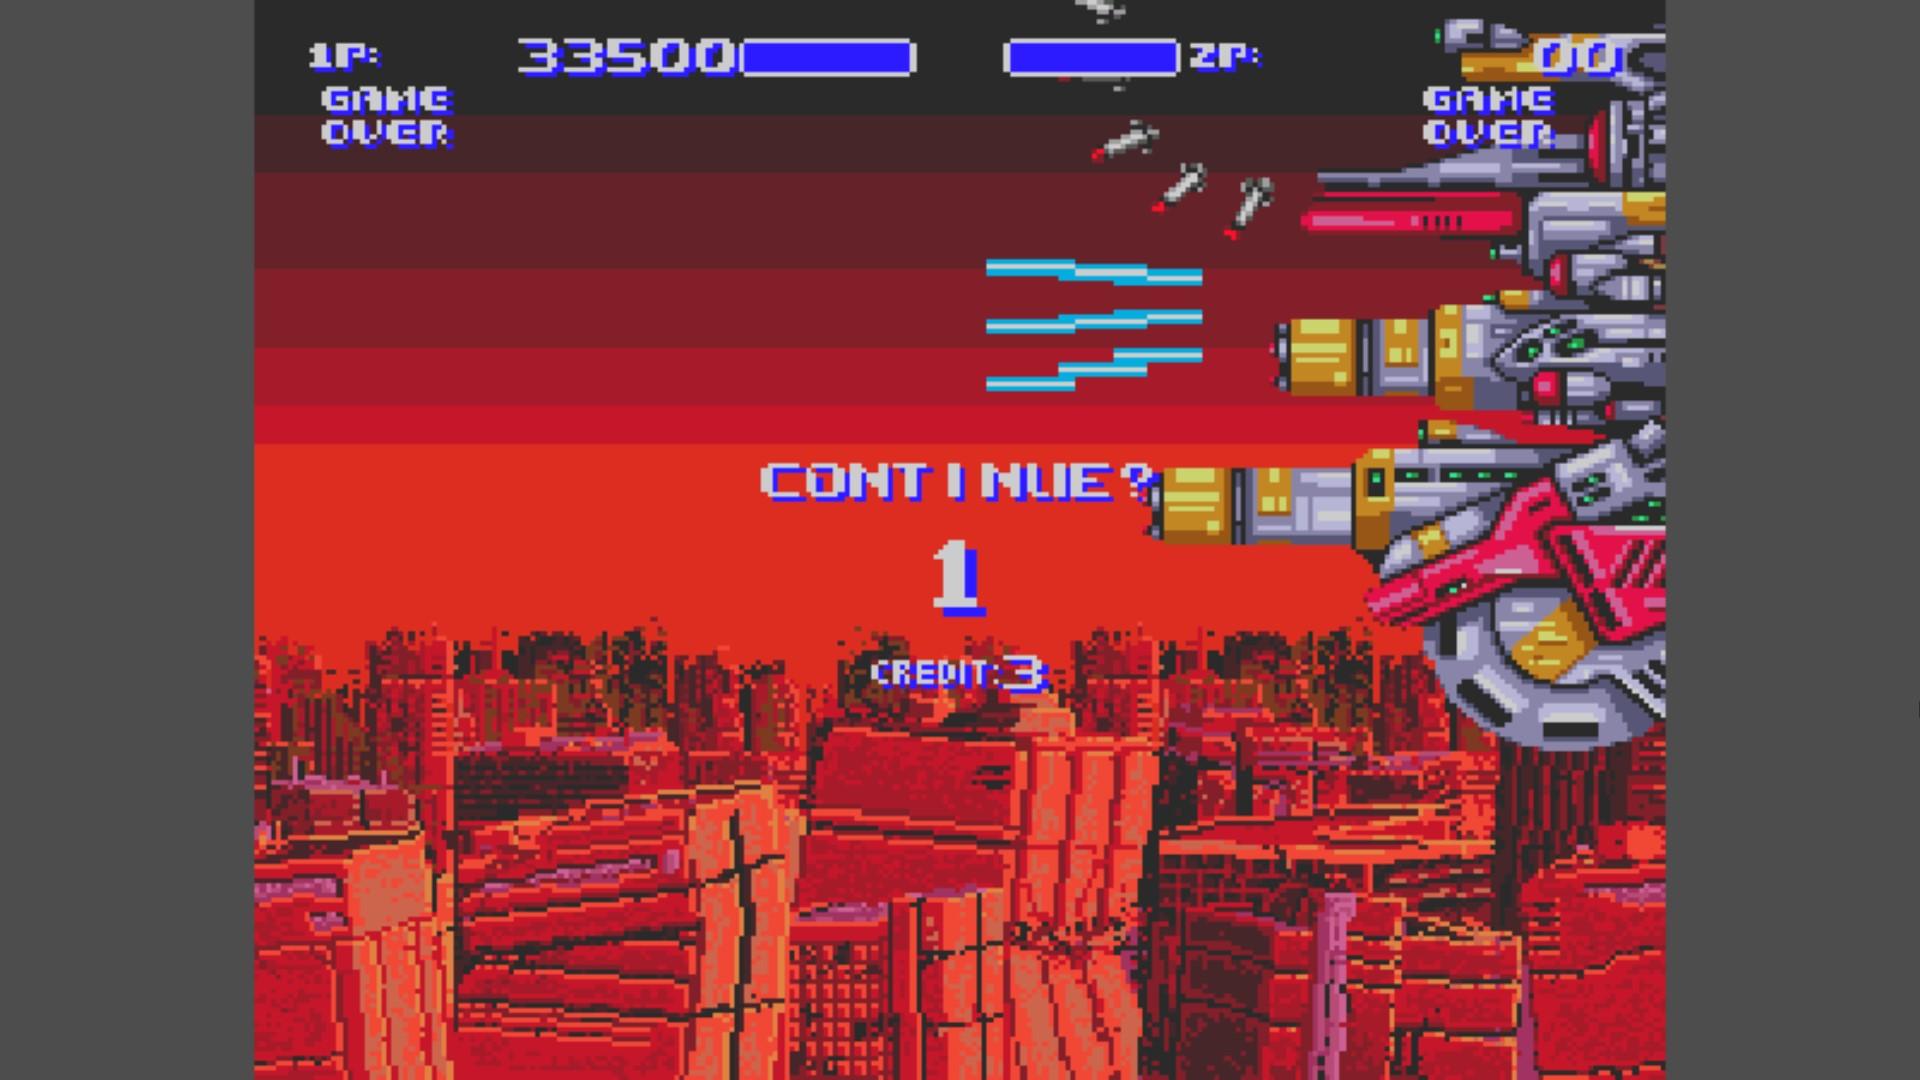 AkinNahtanoj: Air Buster (Sega Genesis / MegaDrive) 33,500 points on 2020-10-31 05:50:51